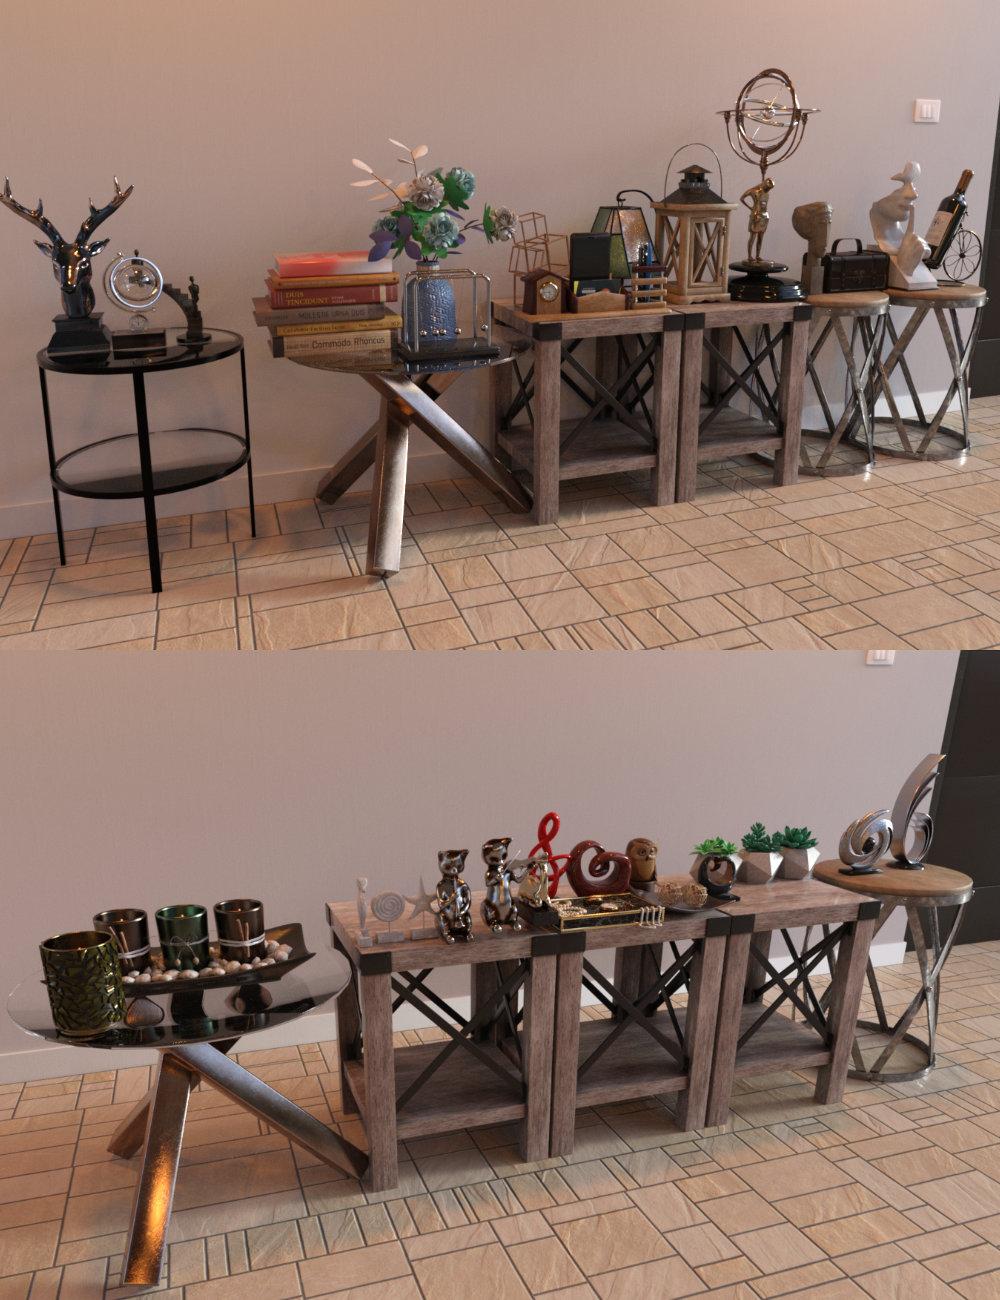 FG Table Top Trinkets by: IronmanFugazi1968, 3D Models by Daz 3D